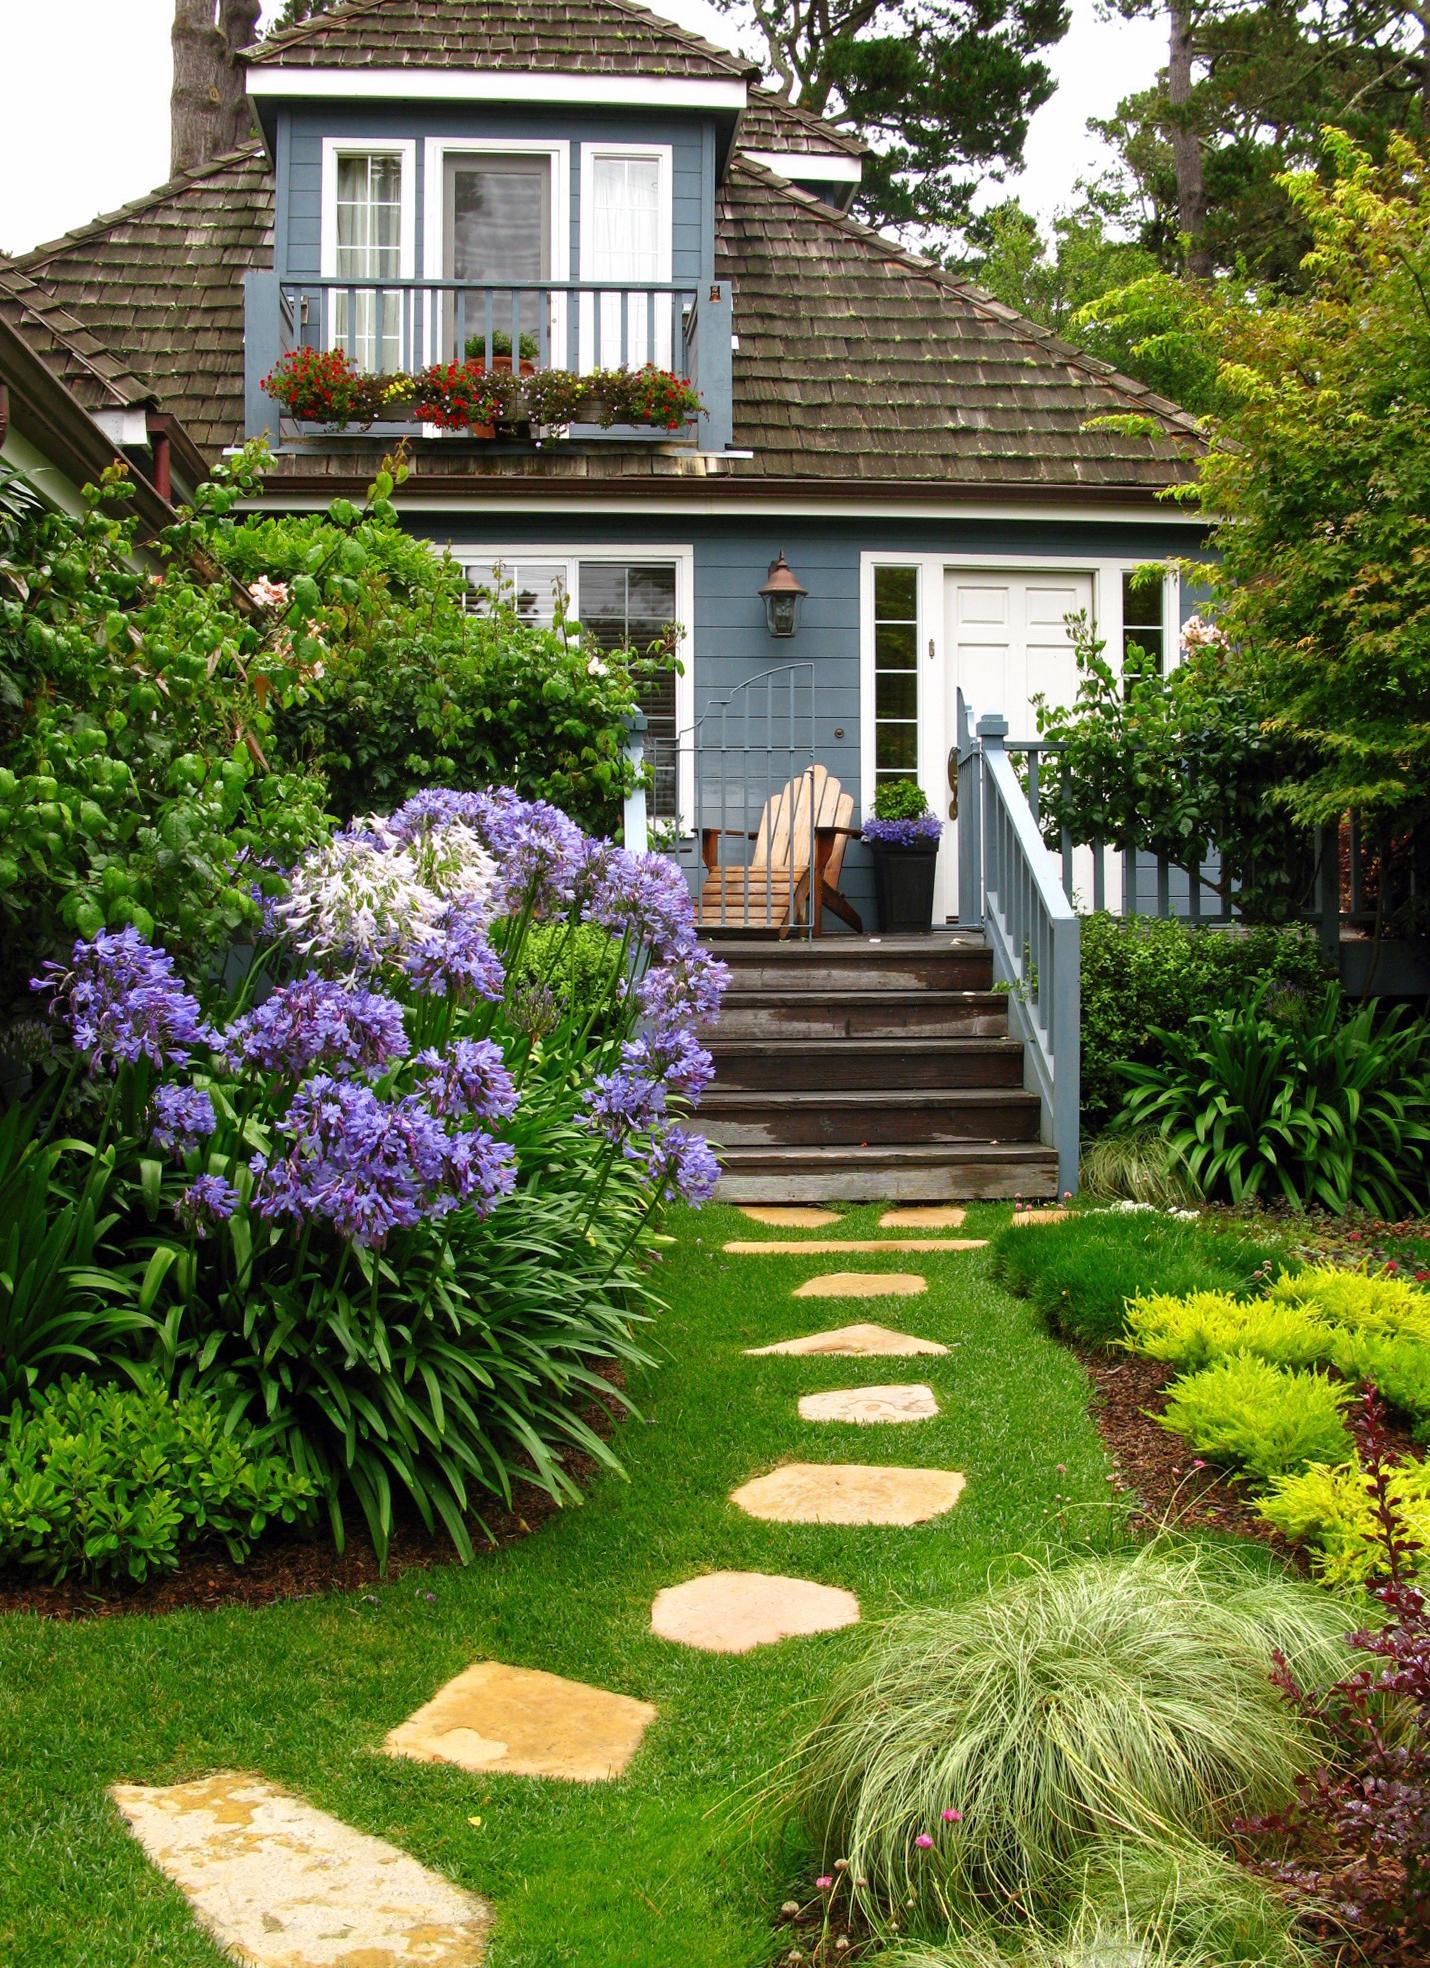 CARMEL'S COTTAGE GARDENS- Stitching The Garden Together